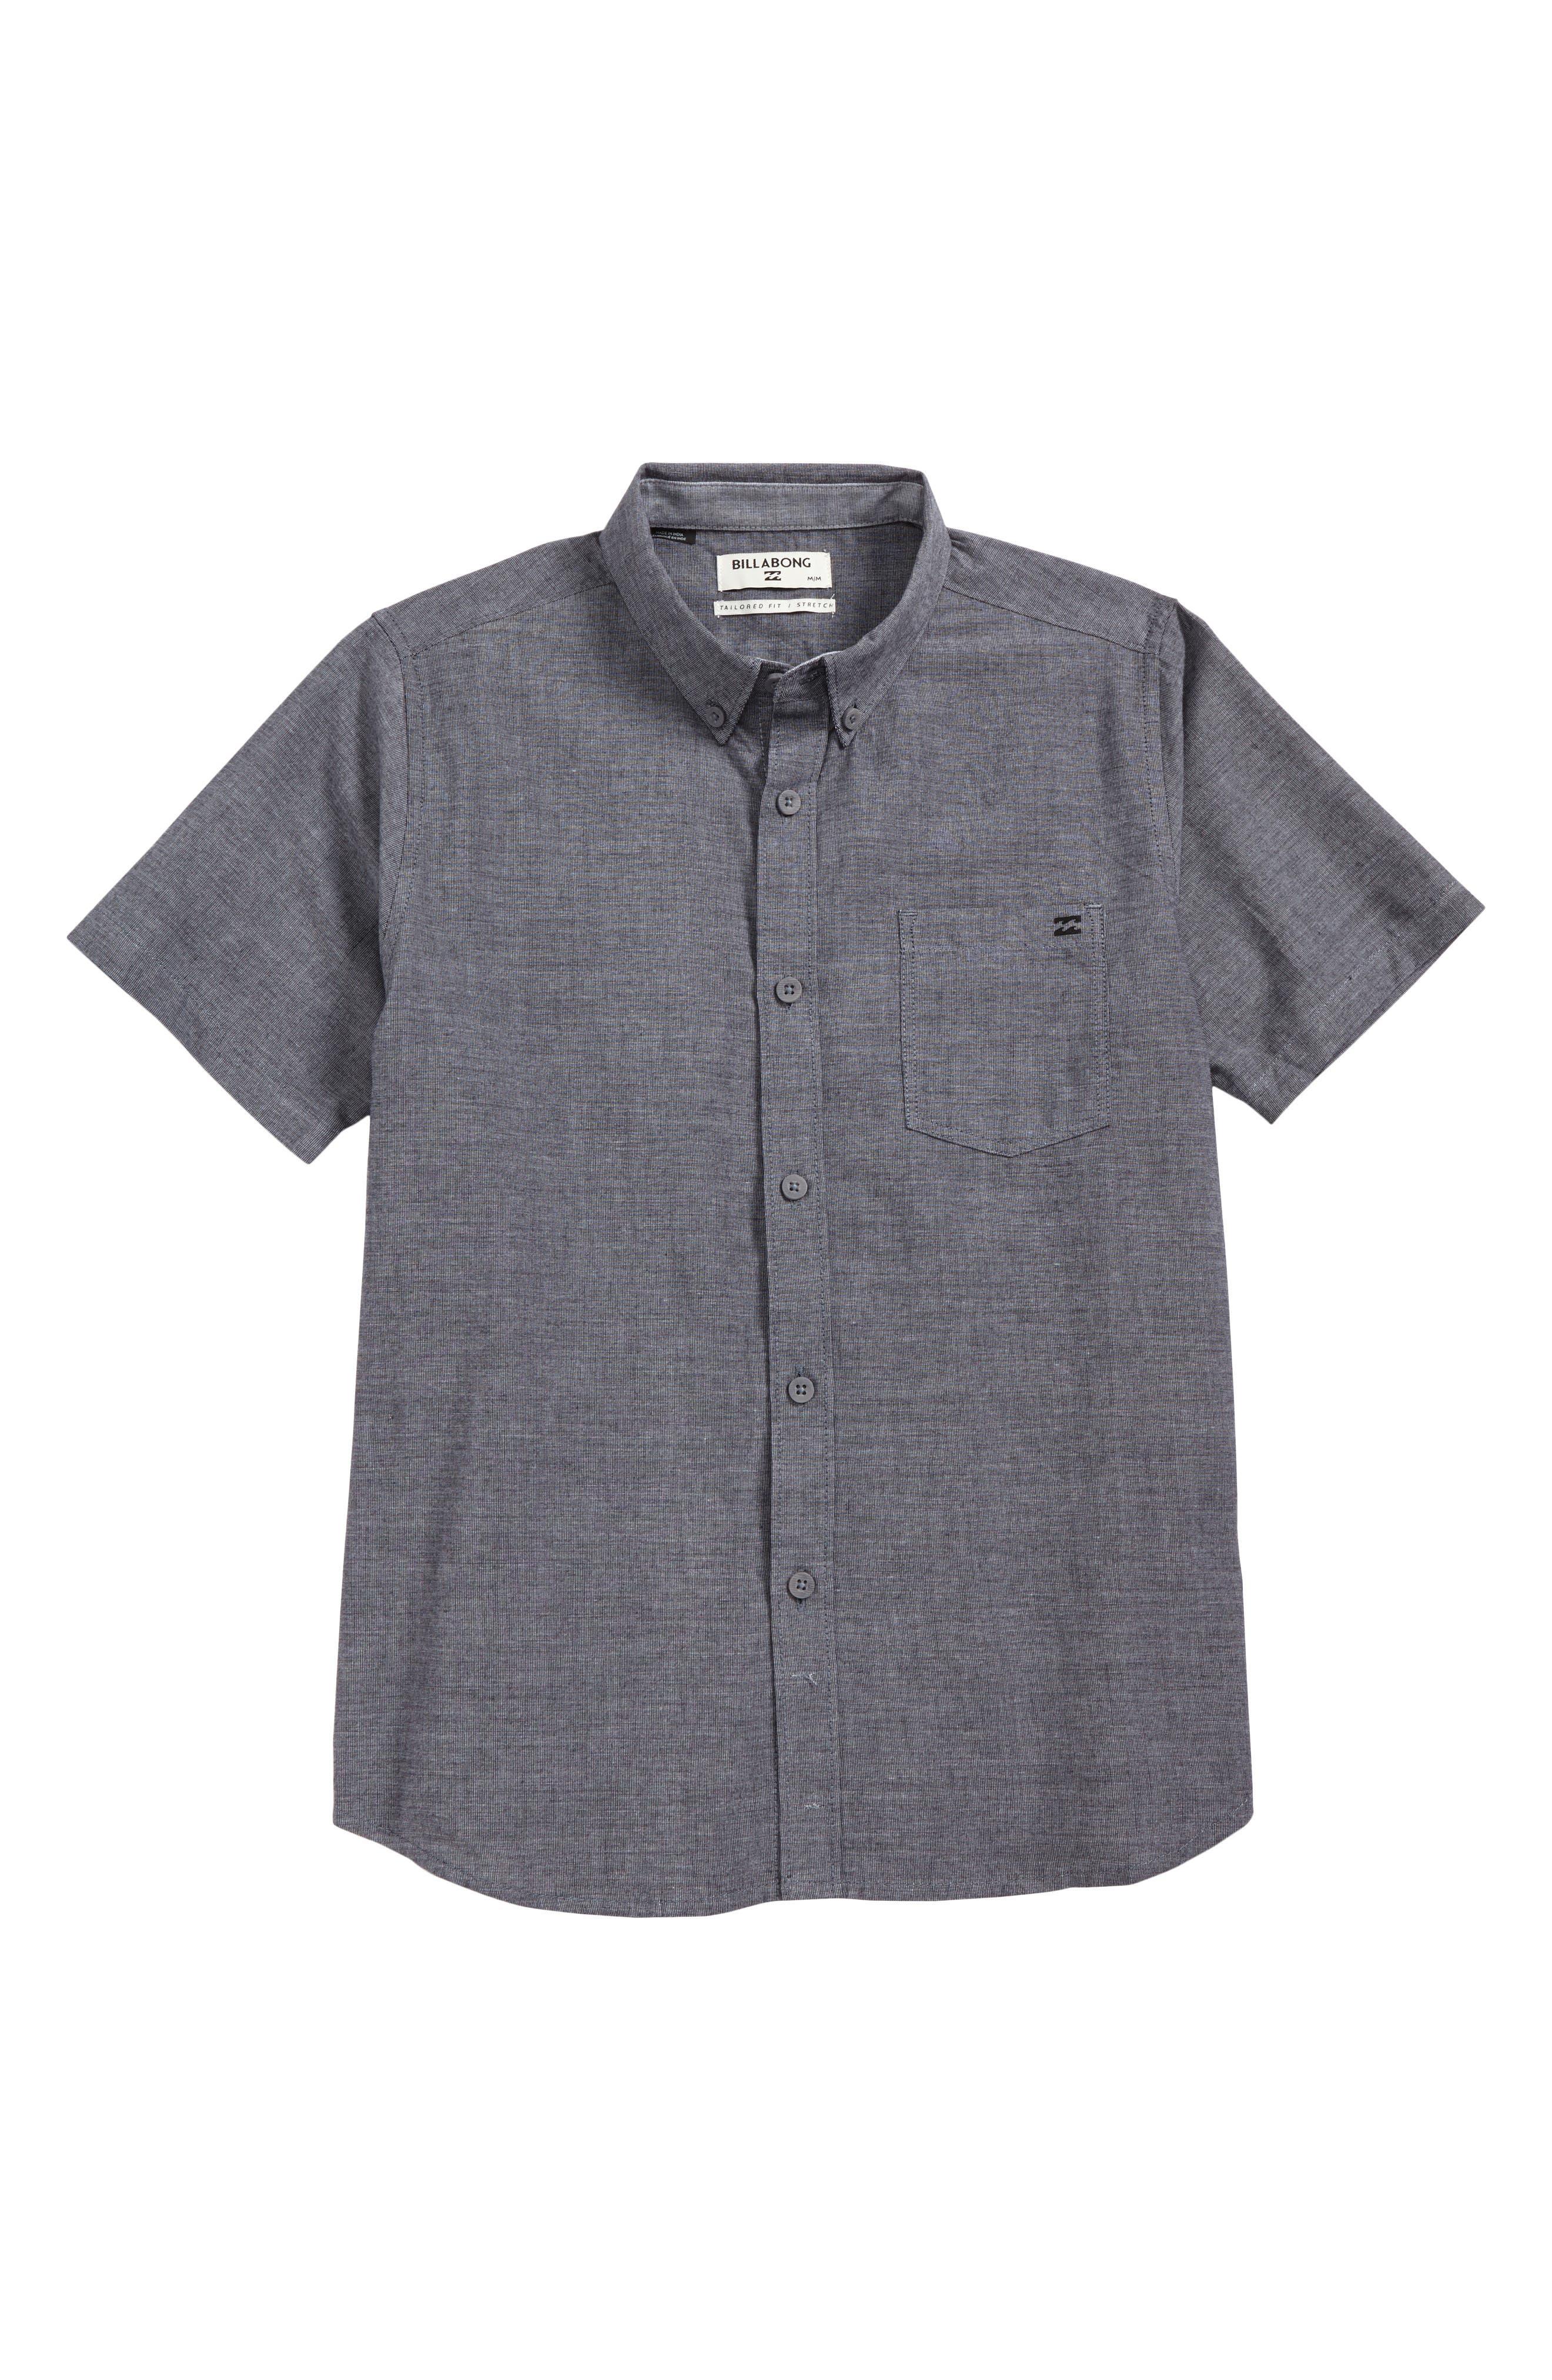 All Day Chambray Shirt,                         Main,                         color, 001